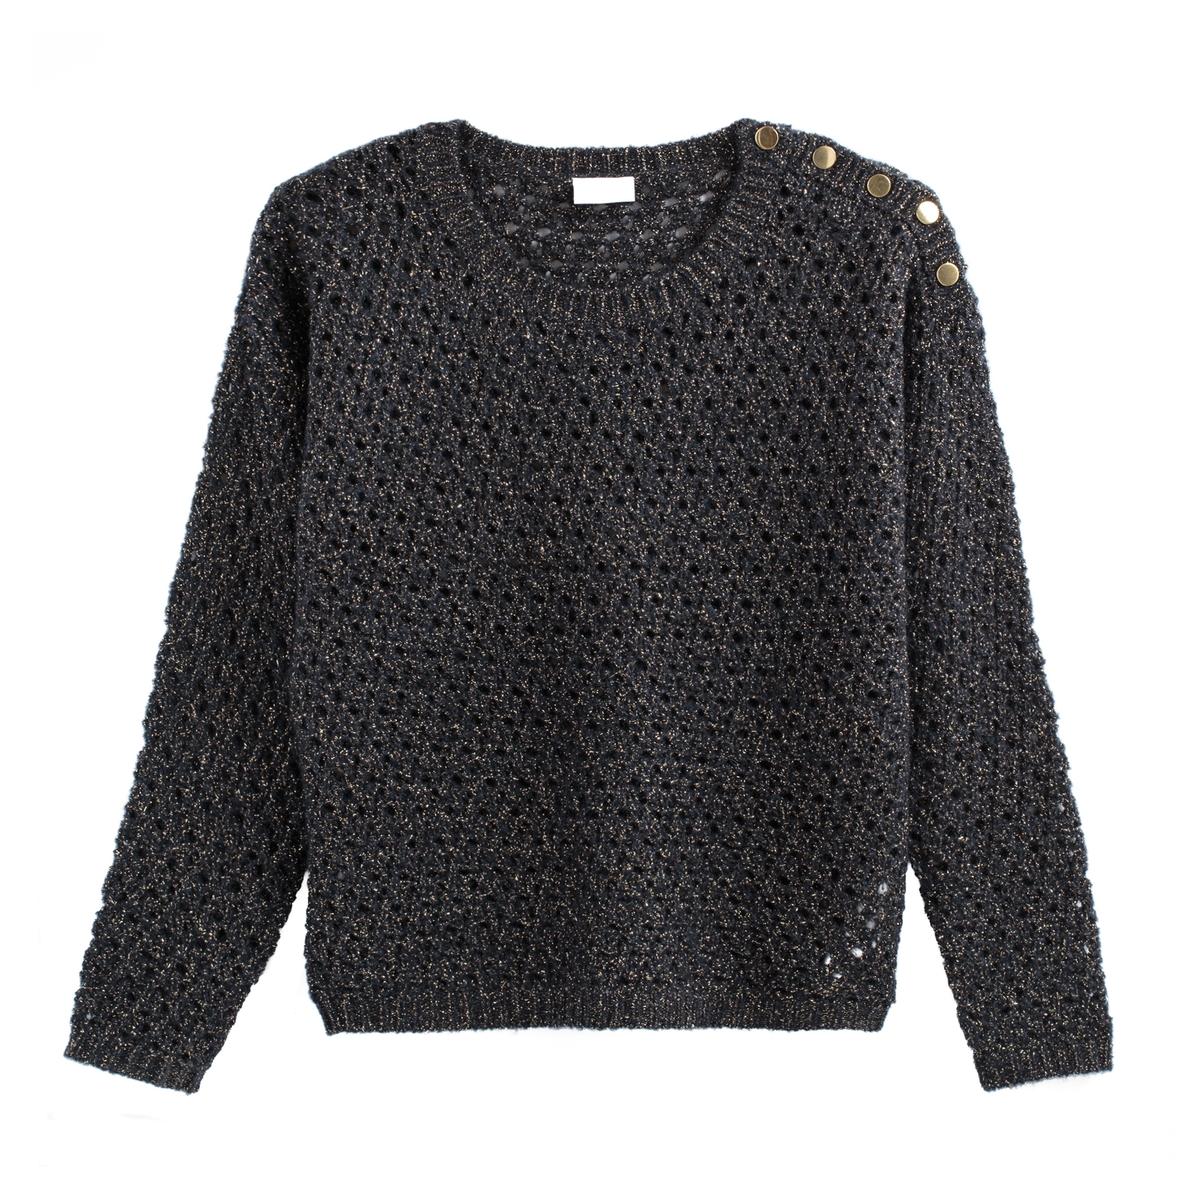 Пуловер ажурный с круглым вырезом, с застежкой на пуговицы на плече ажурный пуловер quelle ajc 787037